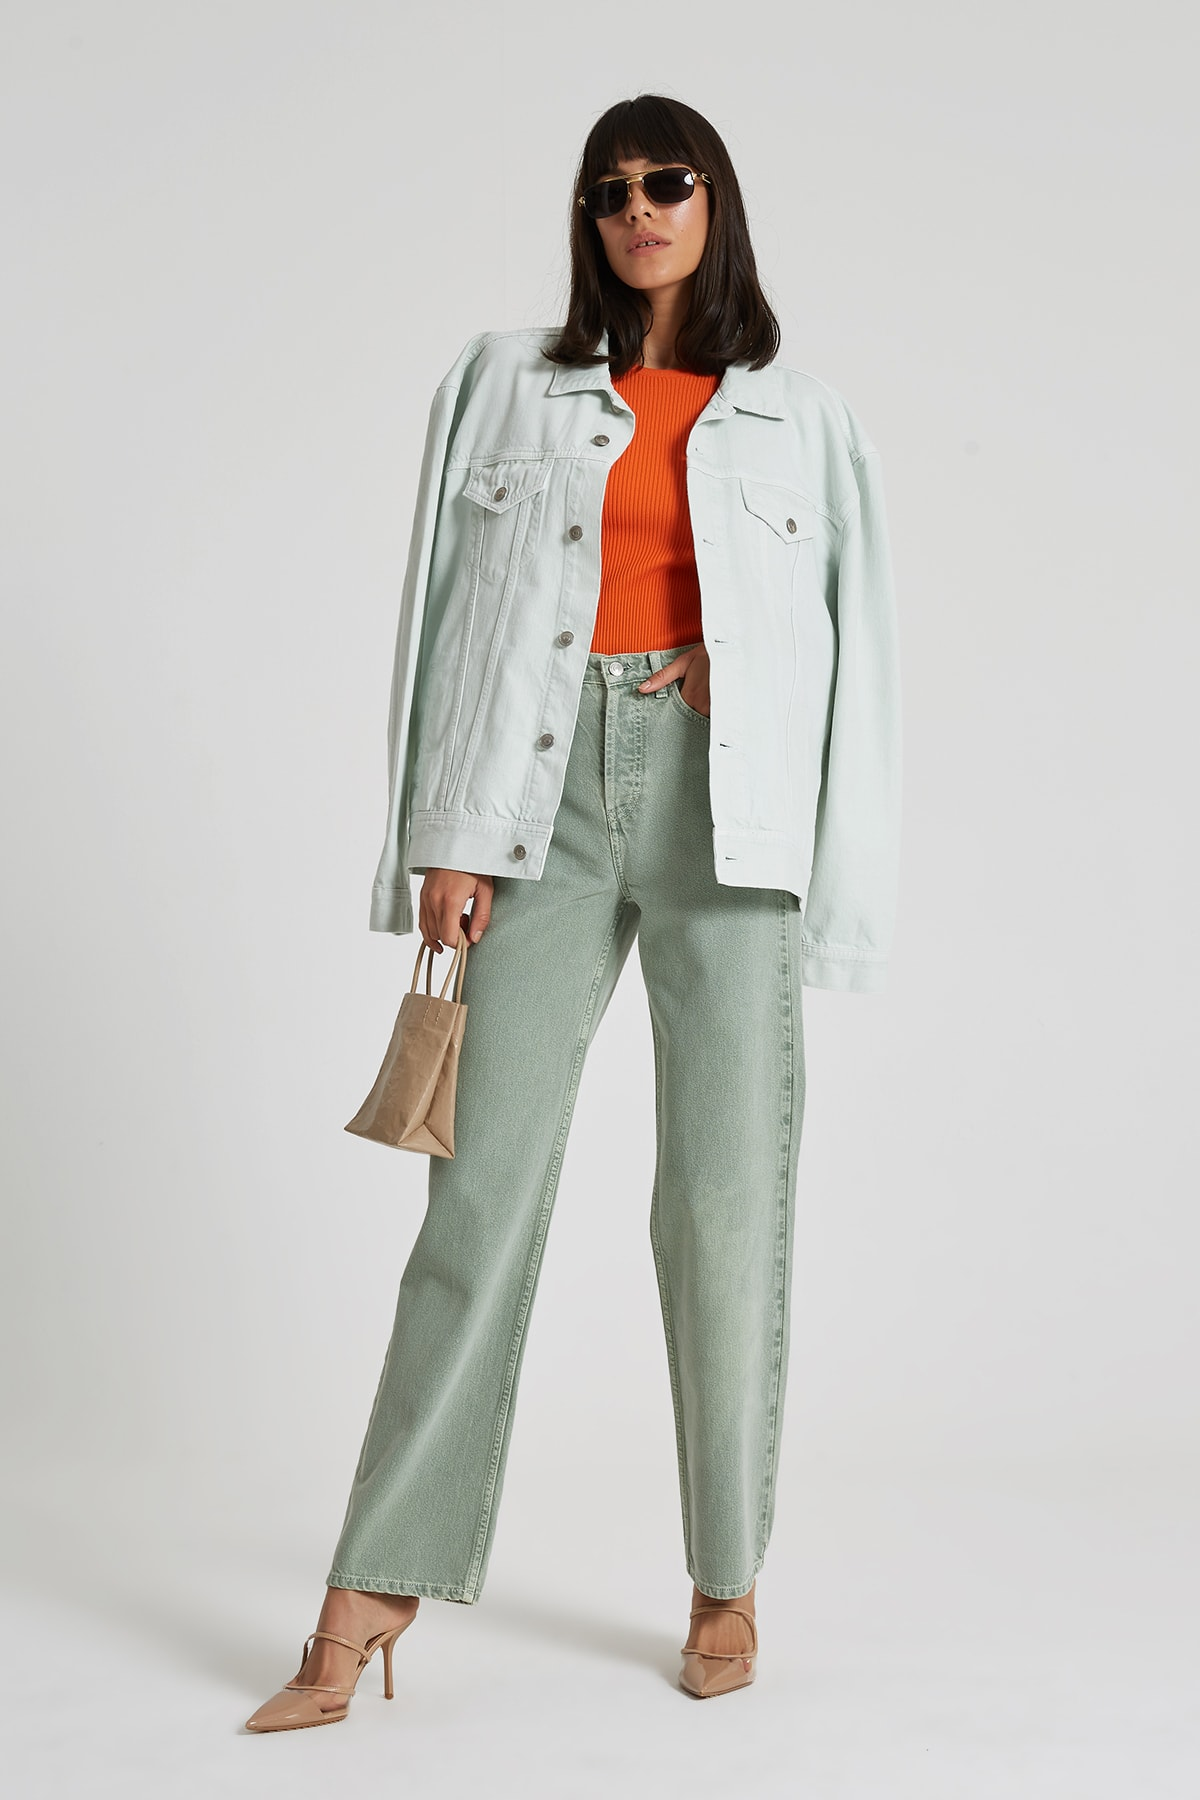 Diana Yüksek Bel Dad Straight Fit Renkli Jean Pantolon C 4517-019